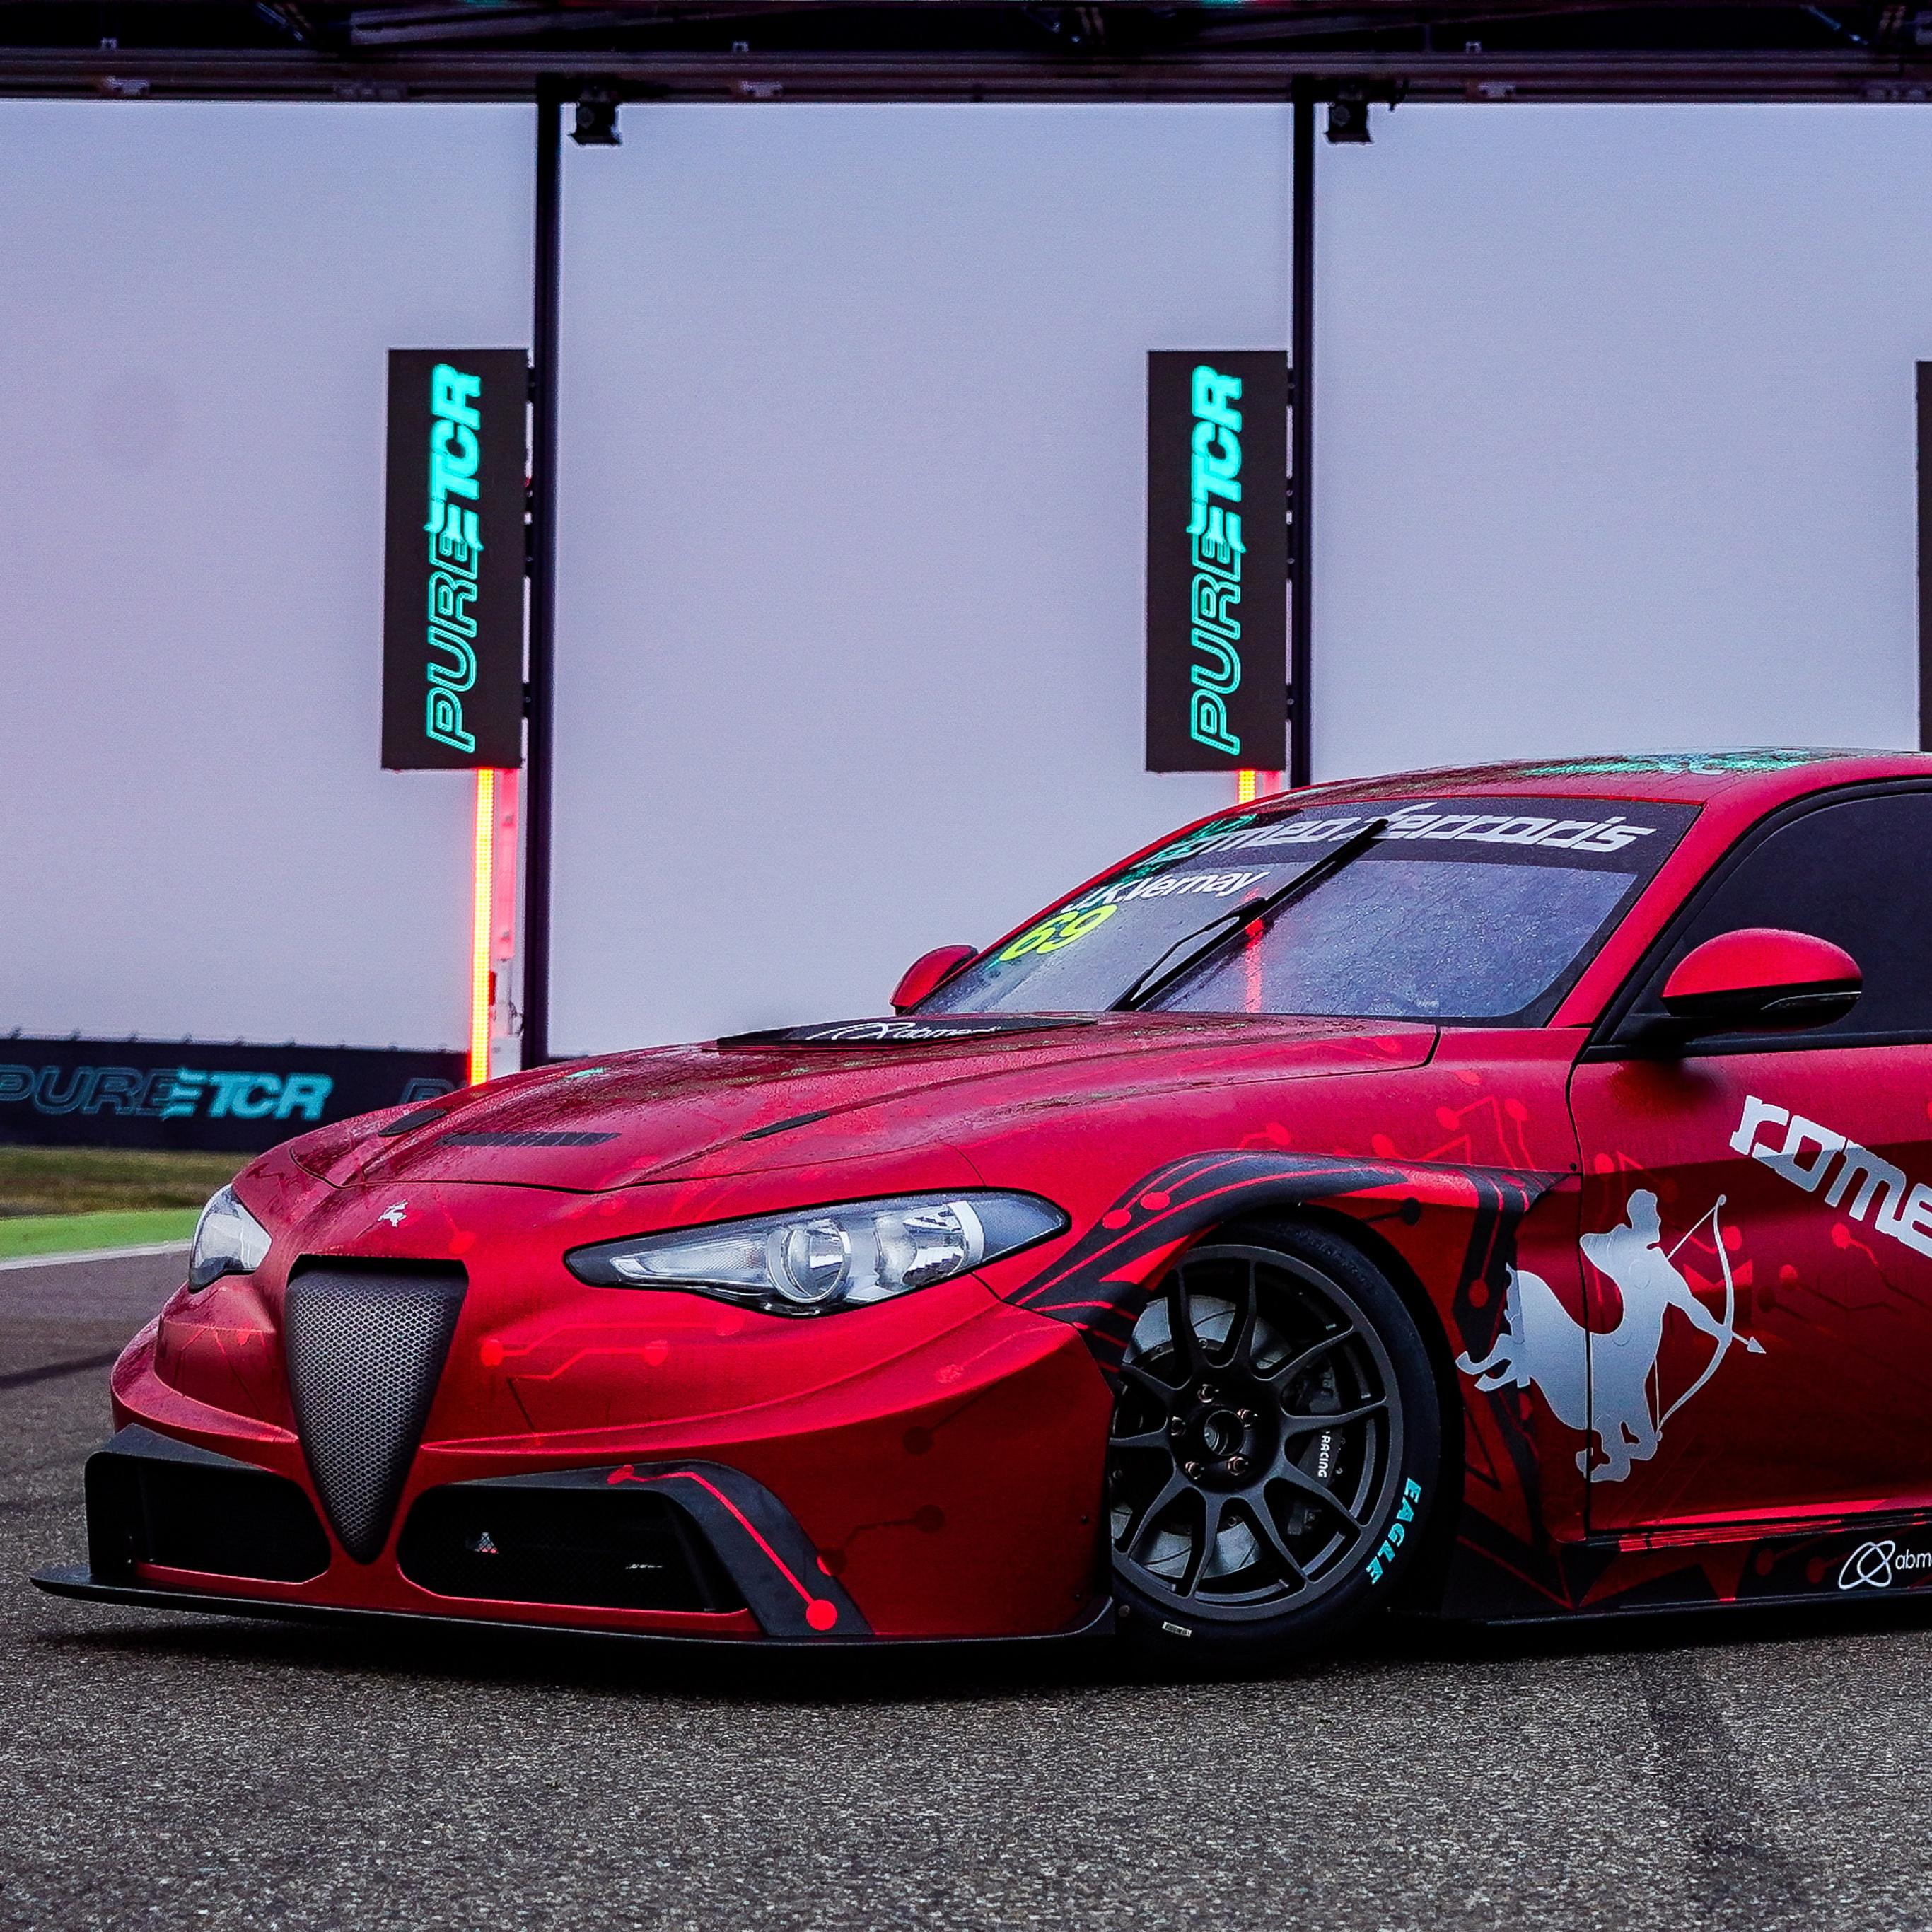 Alfa Romeo Giulia Etcr 4k Wallpaper Romeo Ferraris 2021 Custom Tuning Cars 3882